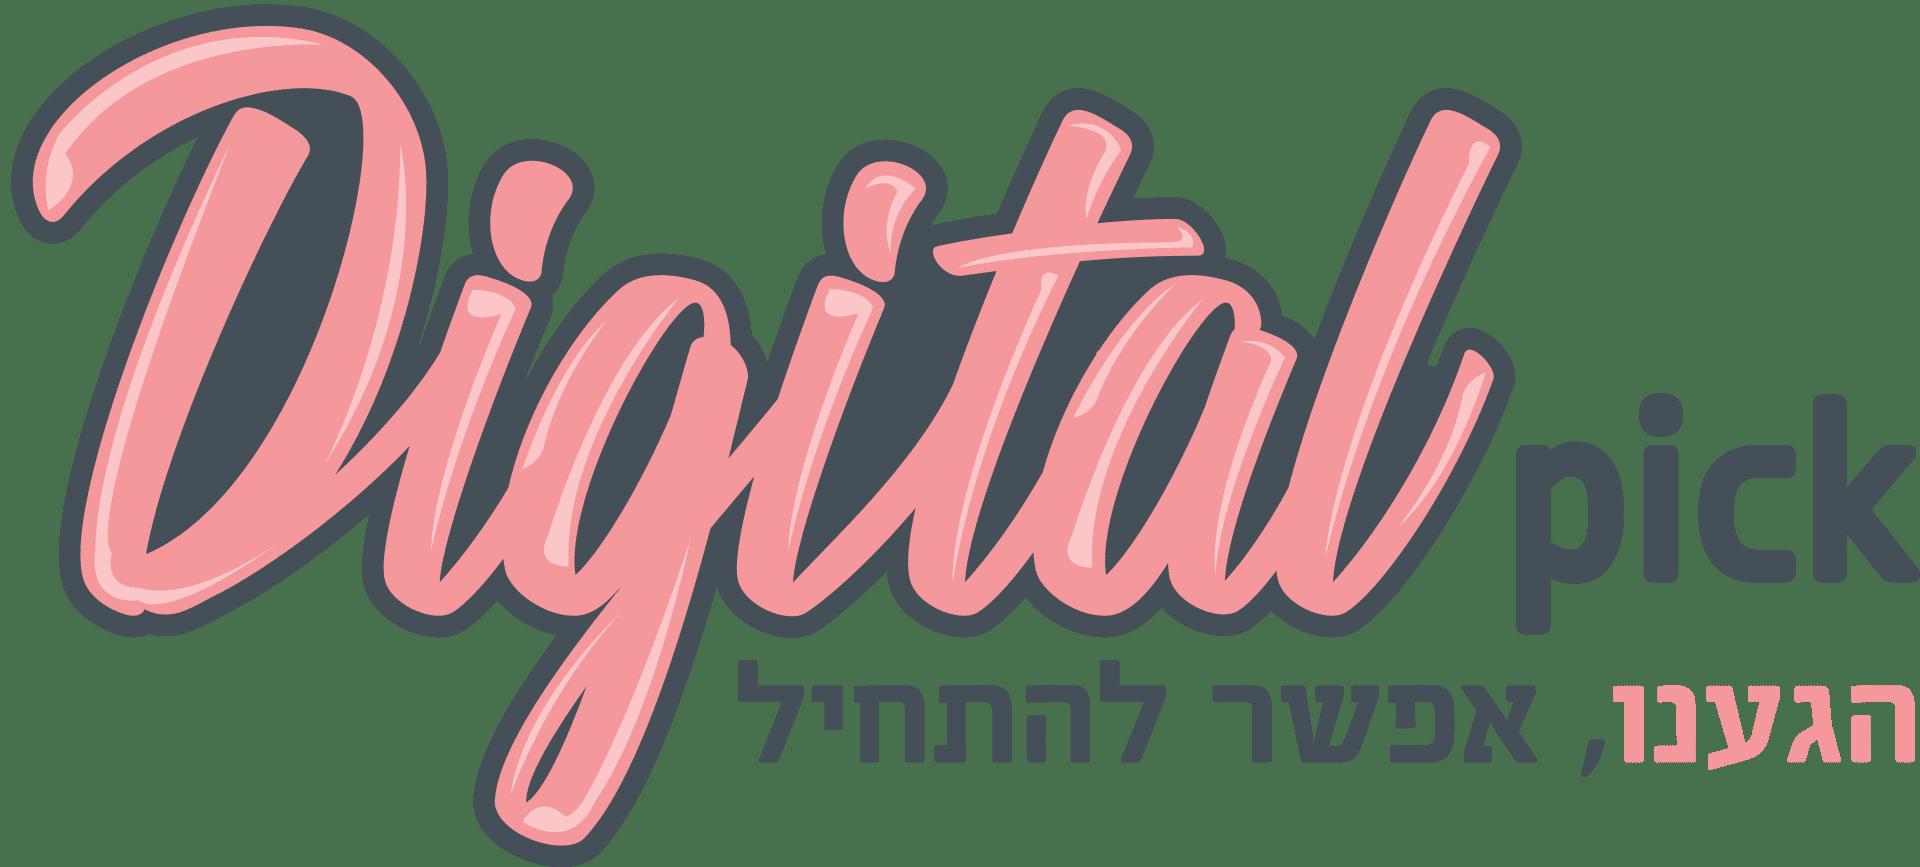 digital pick